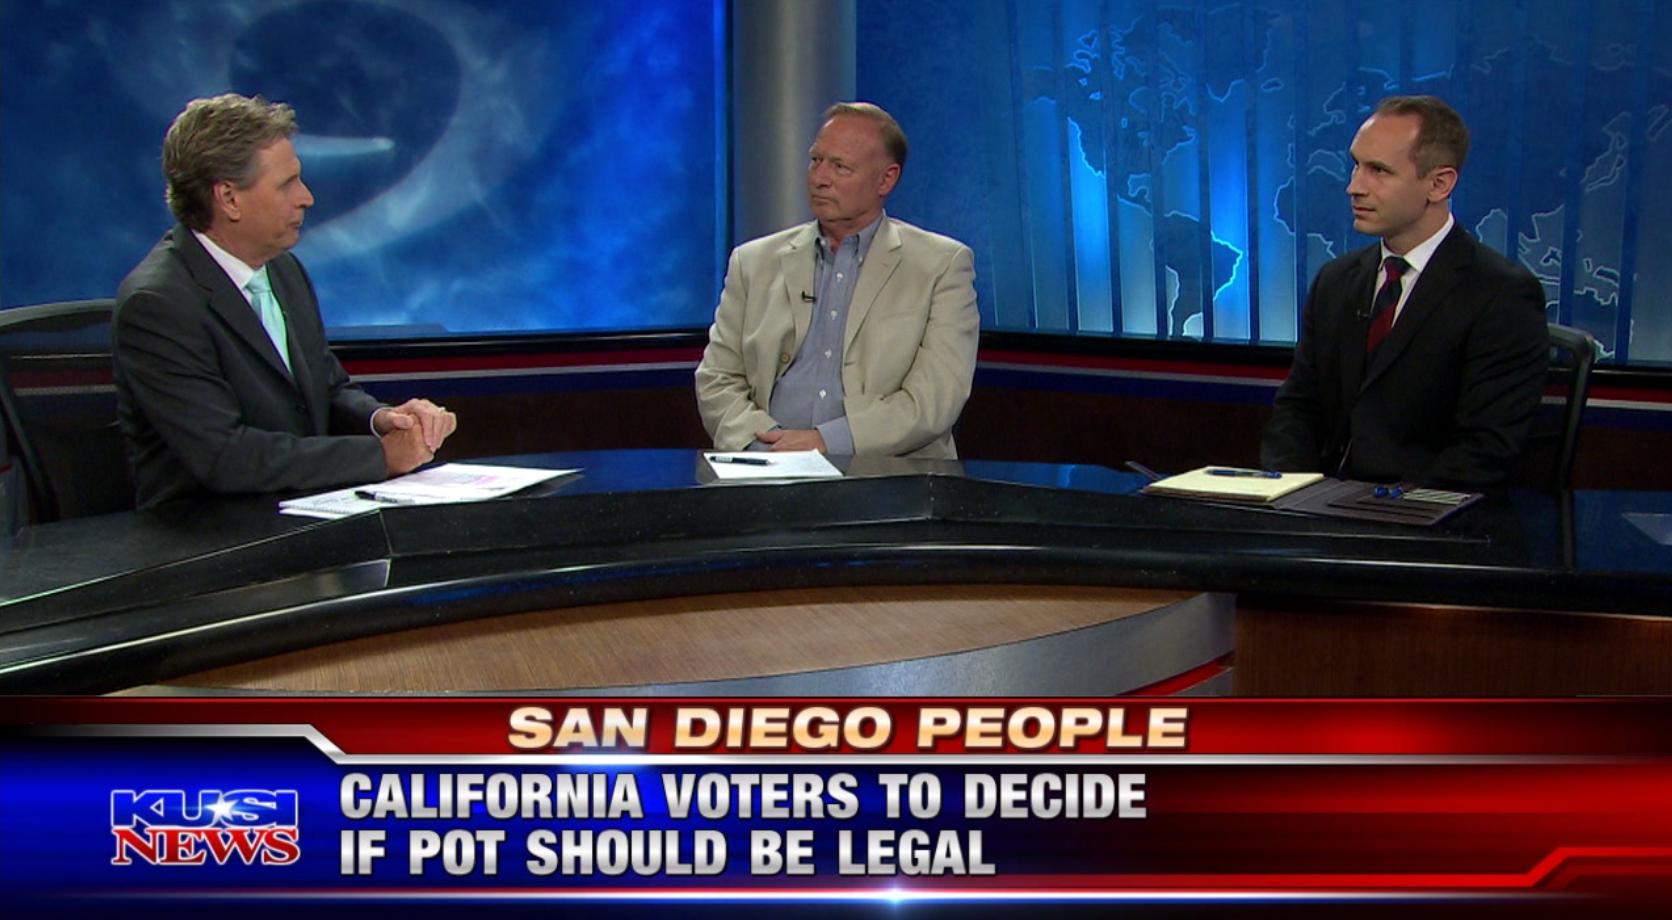 San Diego People: Legalizing Marijuana